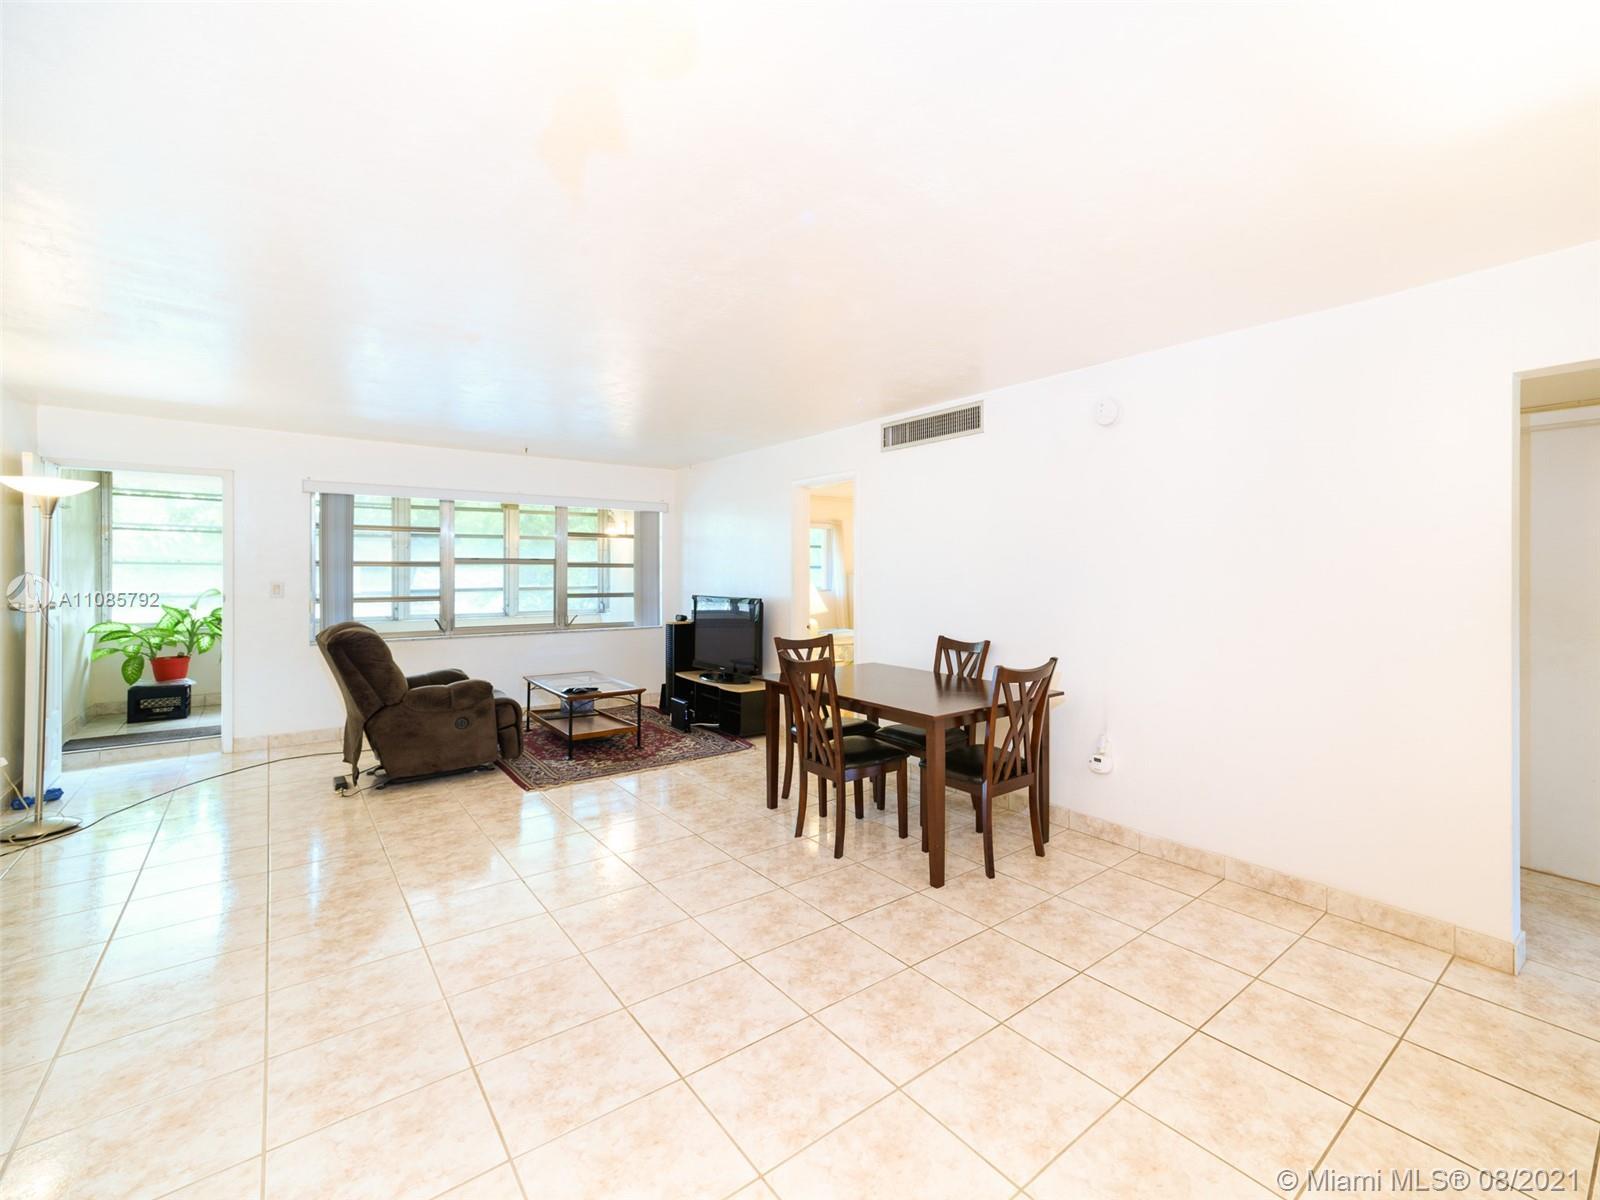 1550 191st St Unit 303, Miami, Florida 33179